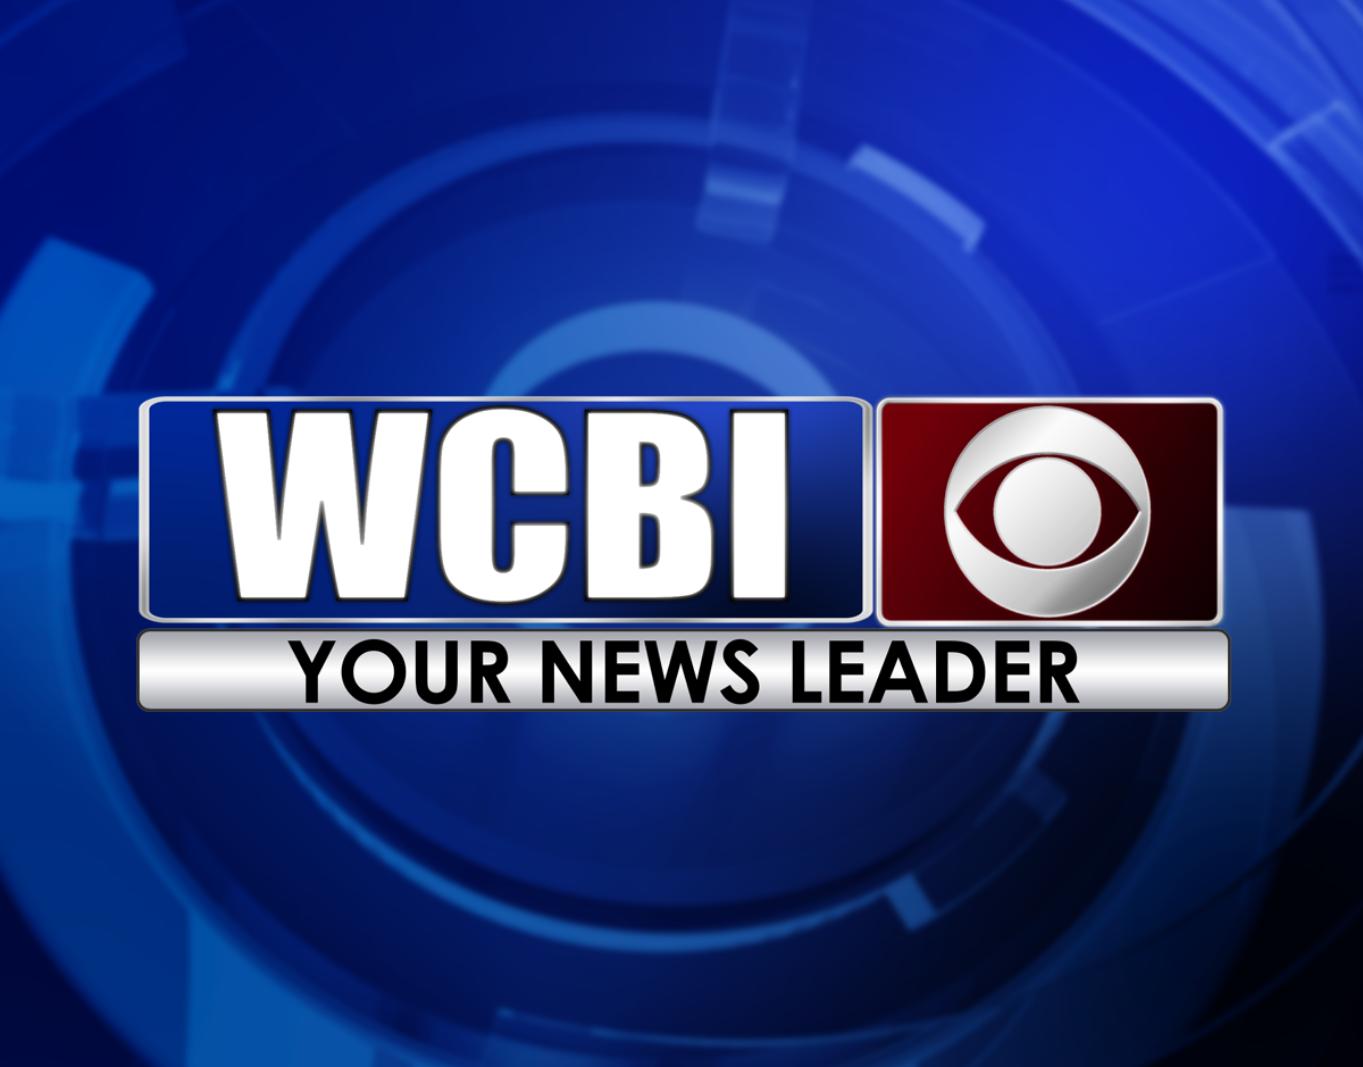 WCBI-TV Keeps You Informed